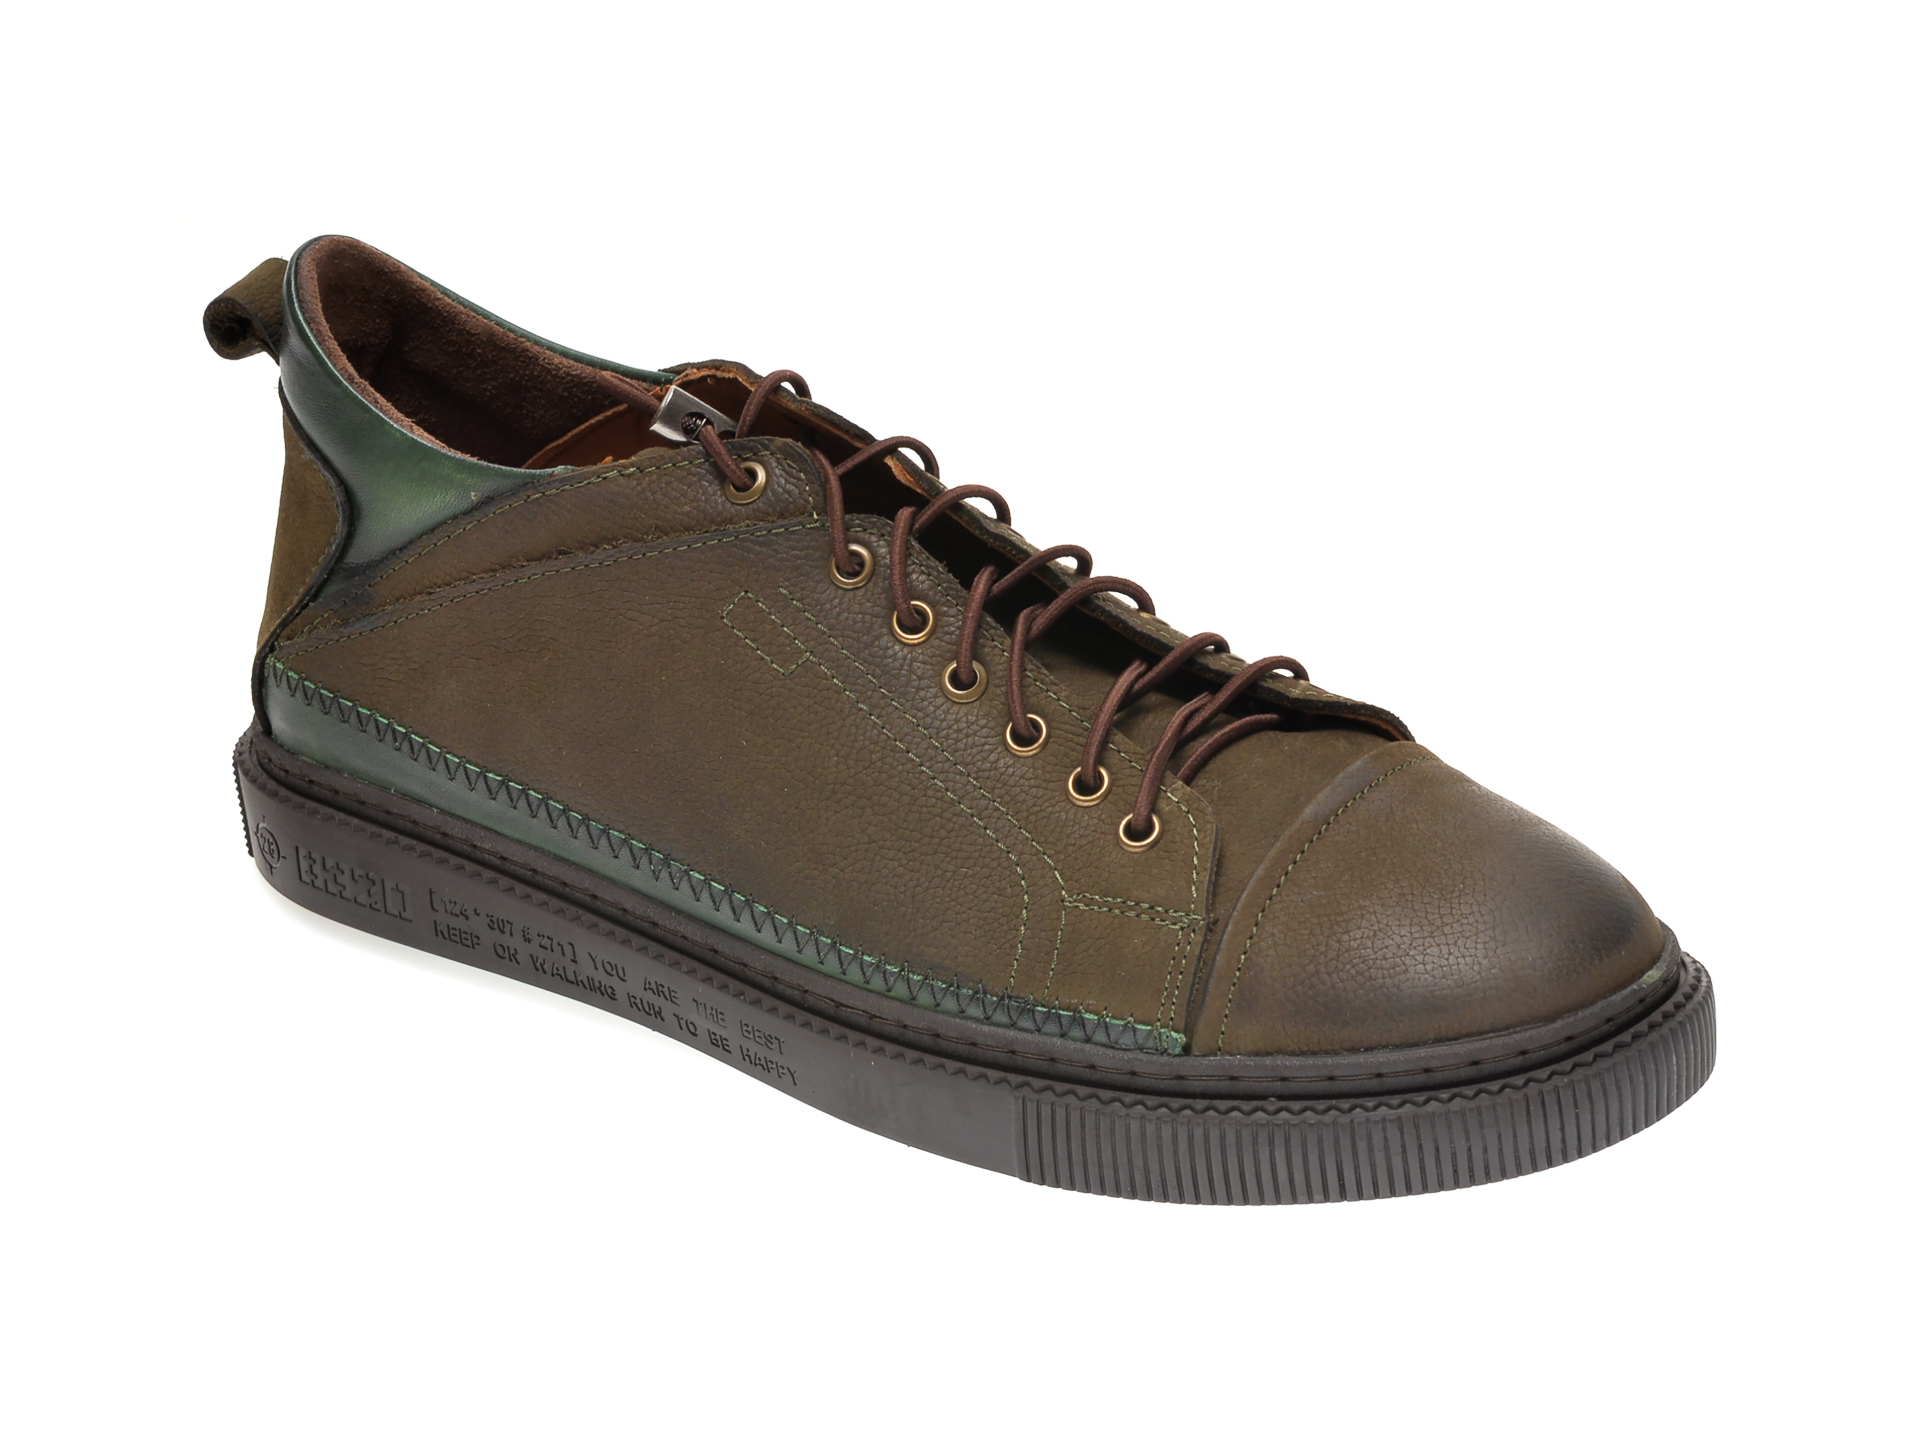 Pantofi OTTER verzi, M5746, din nabuc